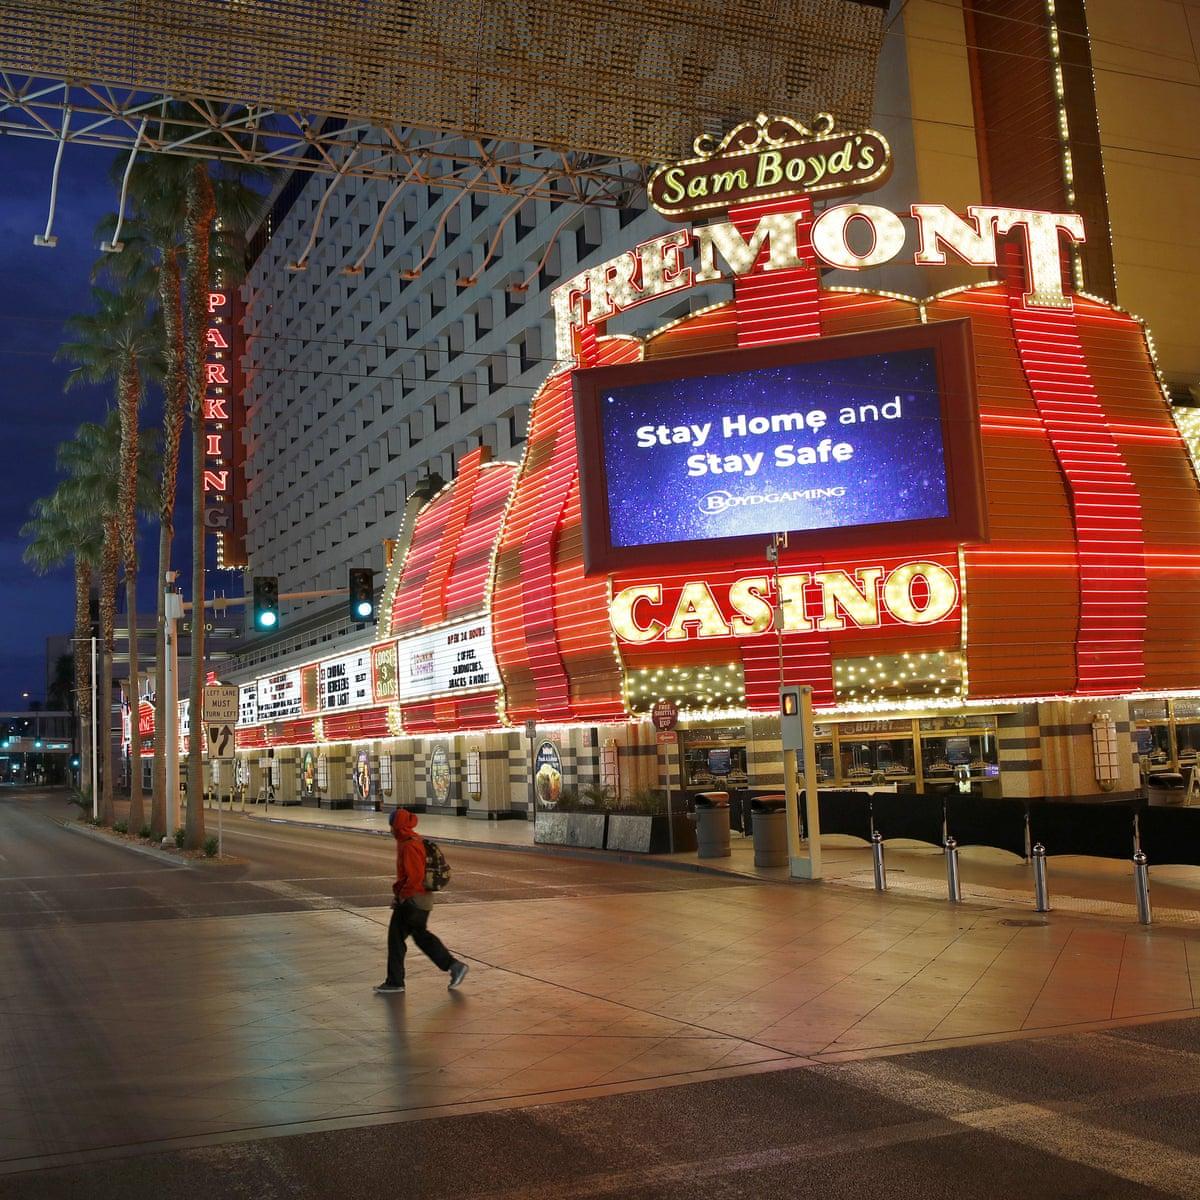 We Re On Virus Time Las Vegas On Edge Amid Reopening Gamble Las Vegas The Guardian